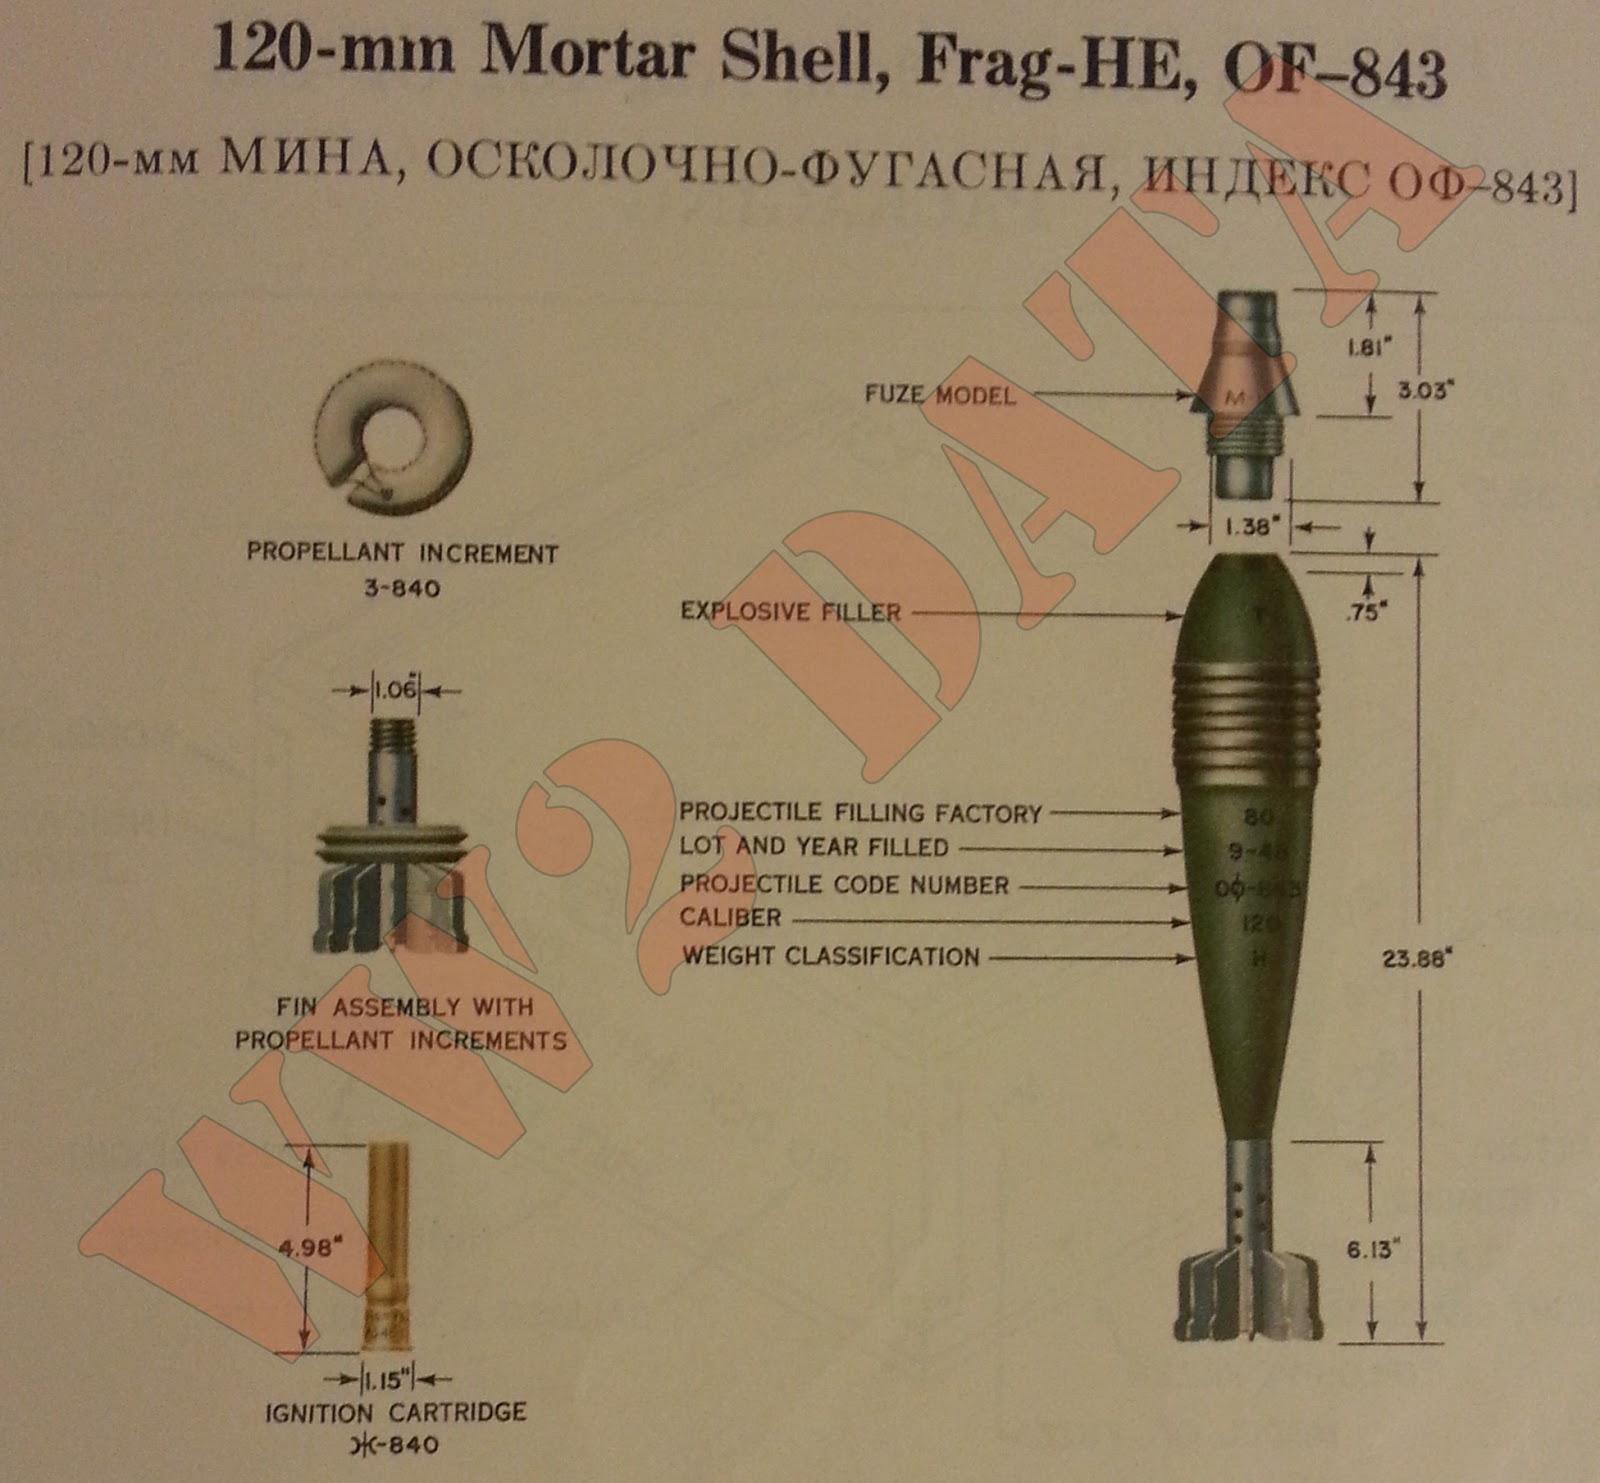 120mm Mortar Shell : Ww equipment data soviet explosive ordance mm